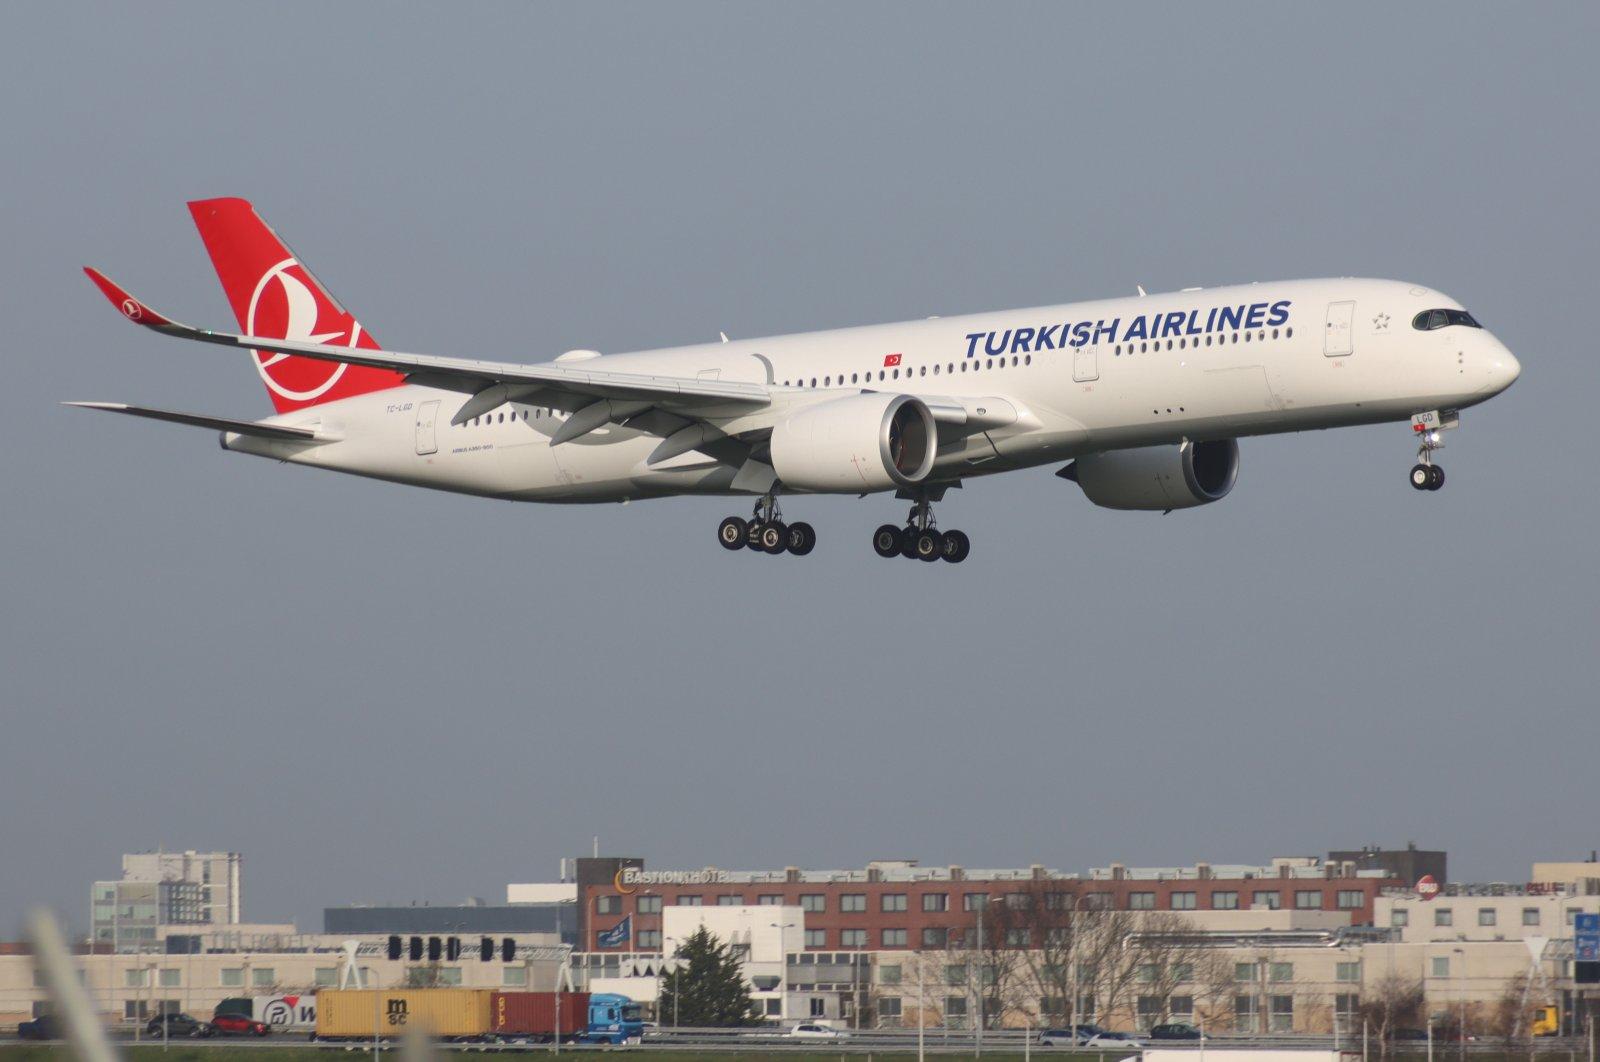 Turkish Airlines 1st major carrier to post profit despite pandemic